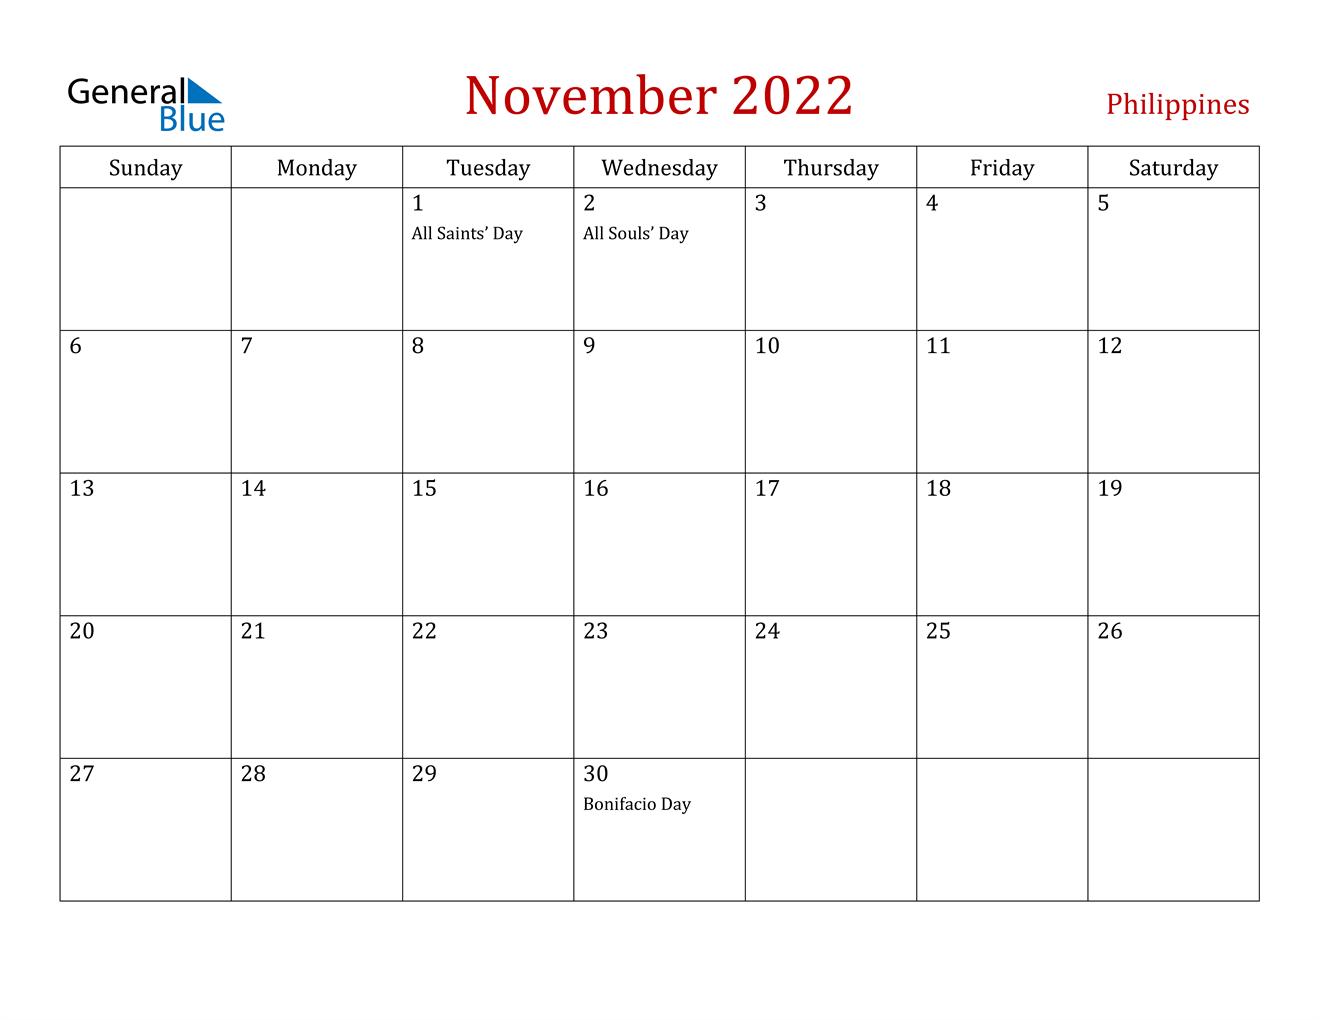 November 2022 Calendar.Philippines November 2022 Calendar With Holidays